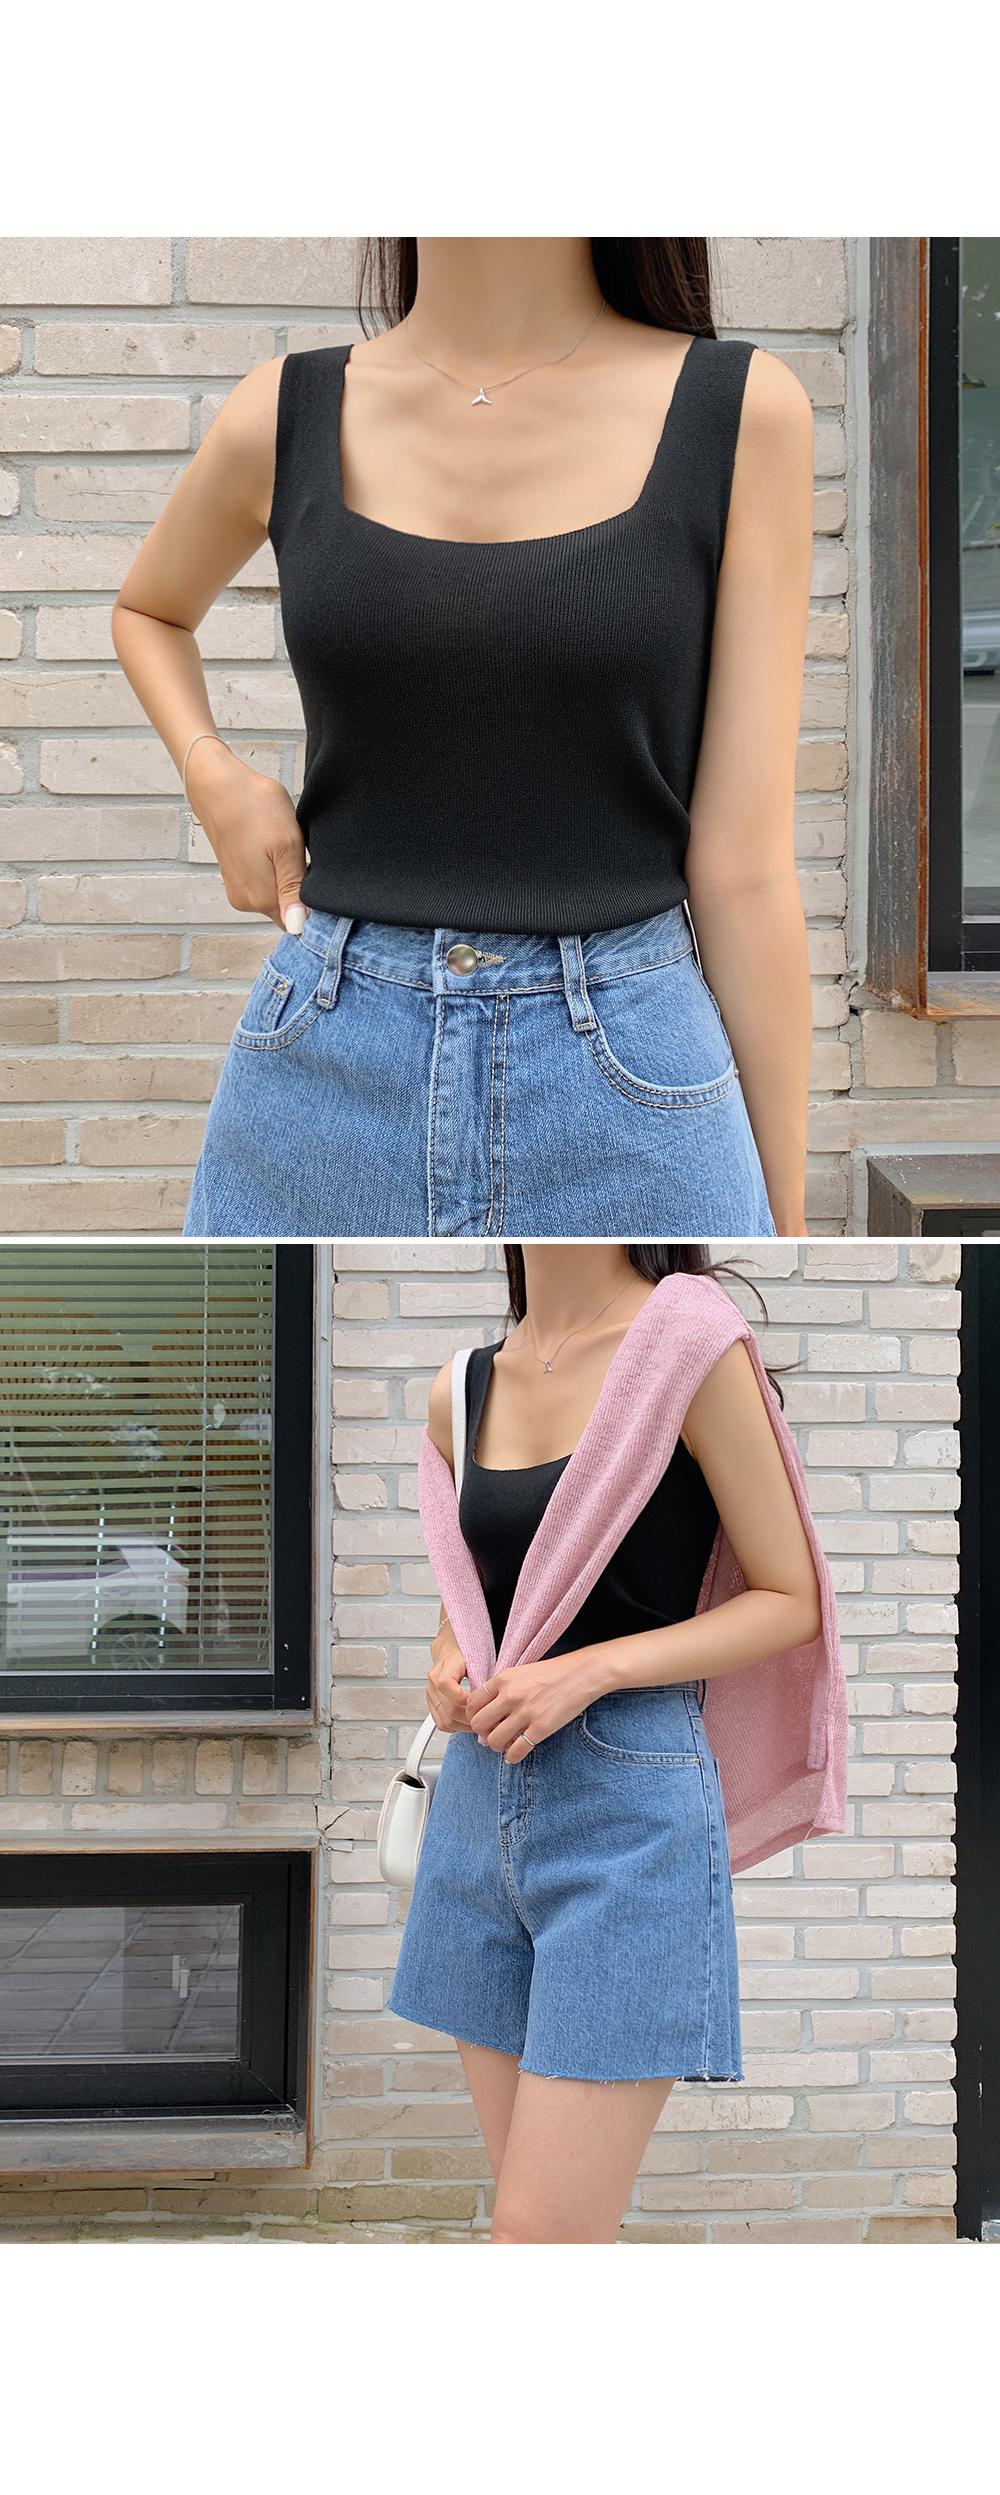 Square Neck Sleeveless Knit Top-holiholic.com